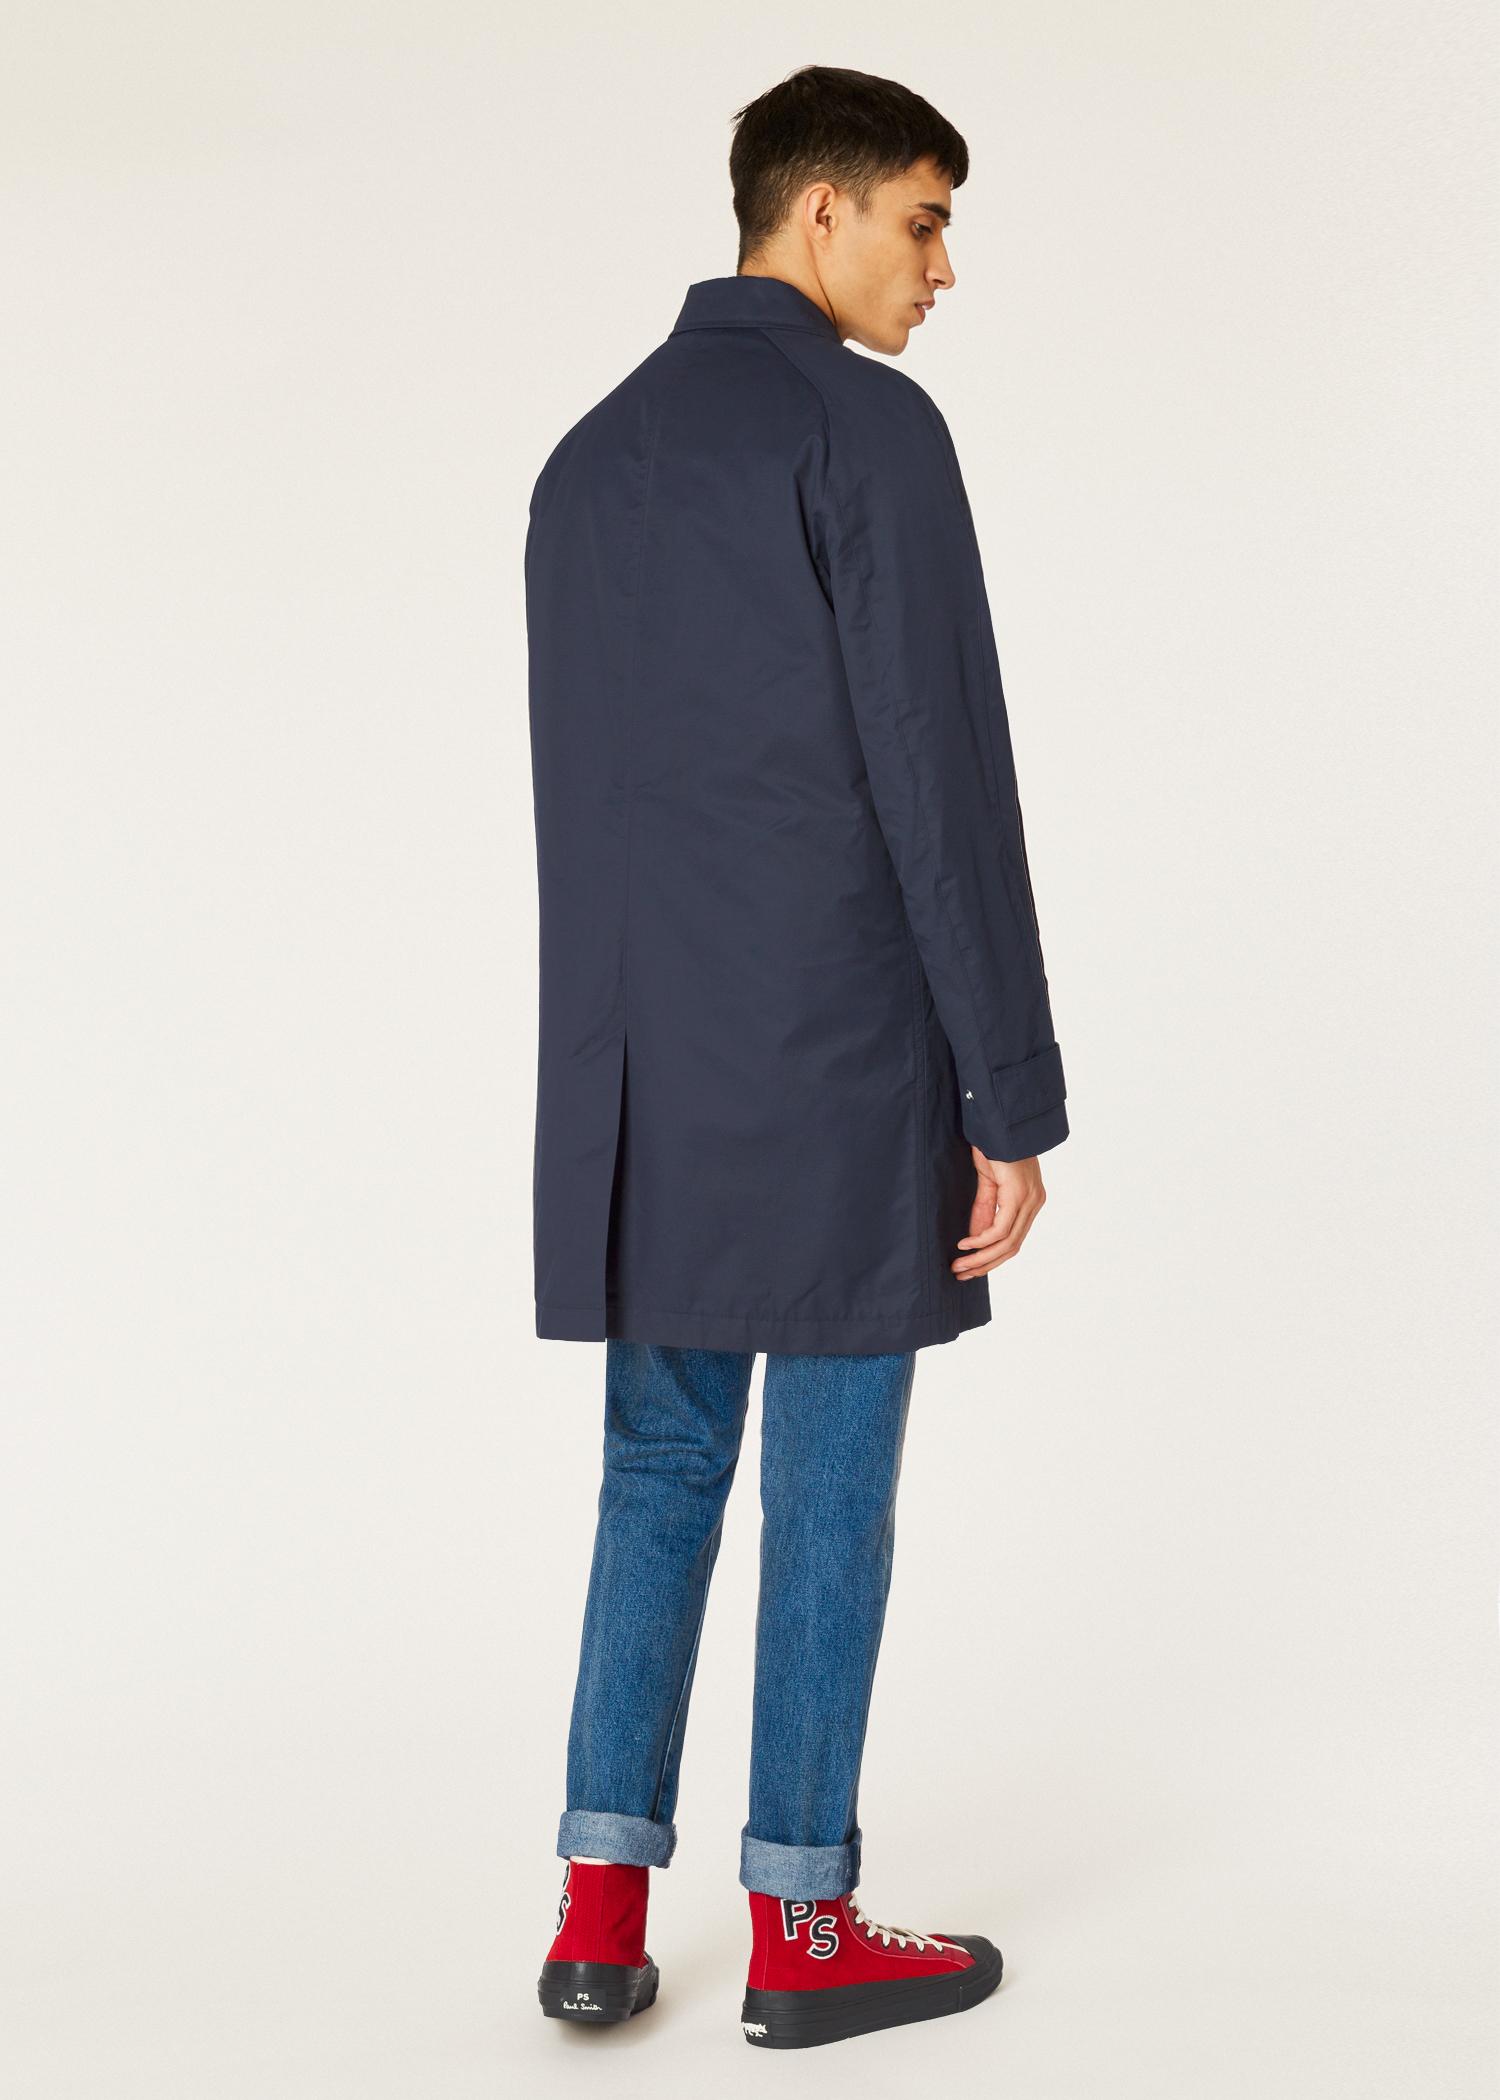 0aa6aaa235ee2 Model back view- Paul Smith Men's Navy Cotton-Blend Unlined 2-In-